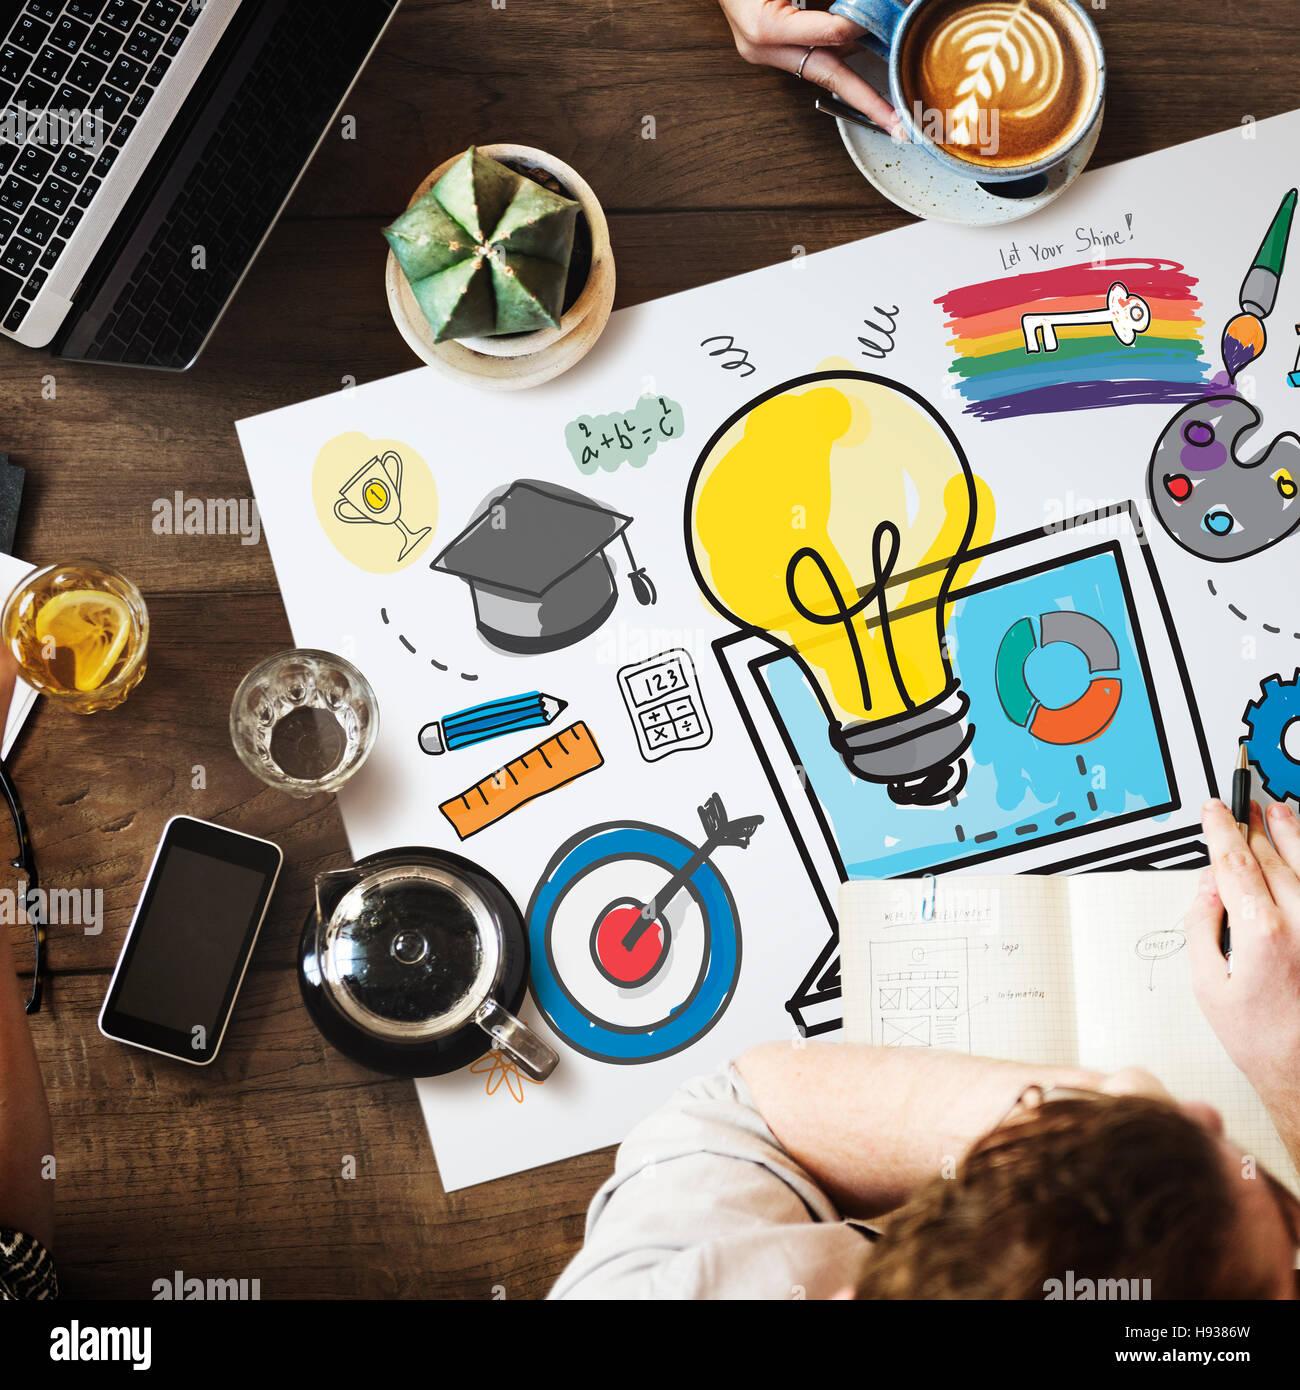 Inspiration Aspiration Sources Data Idea Ideas Concept - Stock Image